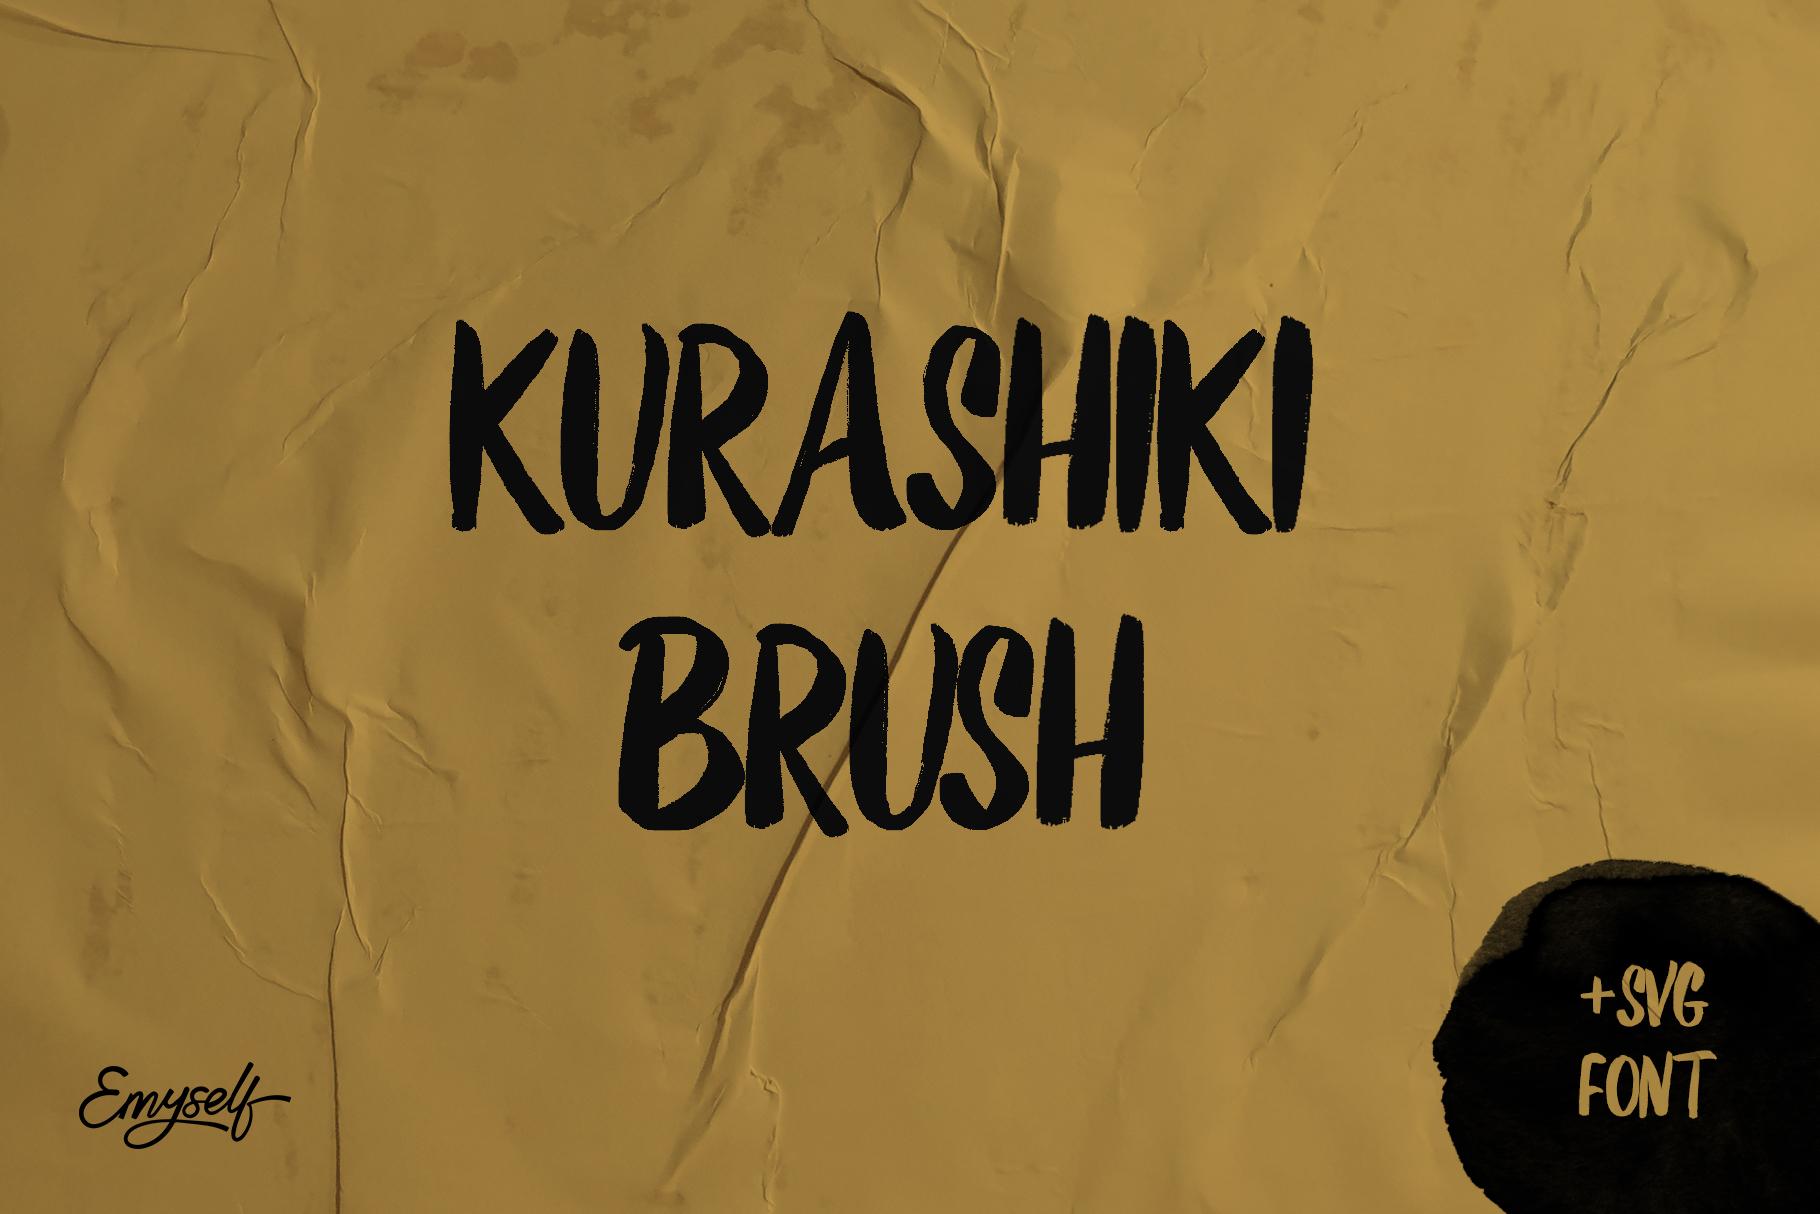 Kurashiki Brush example image 1